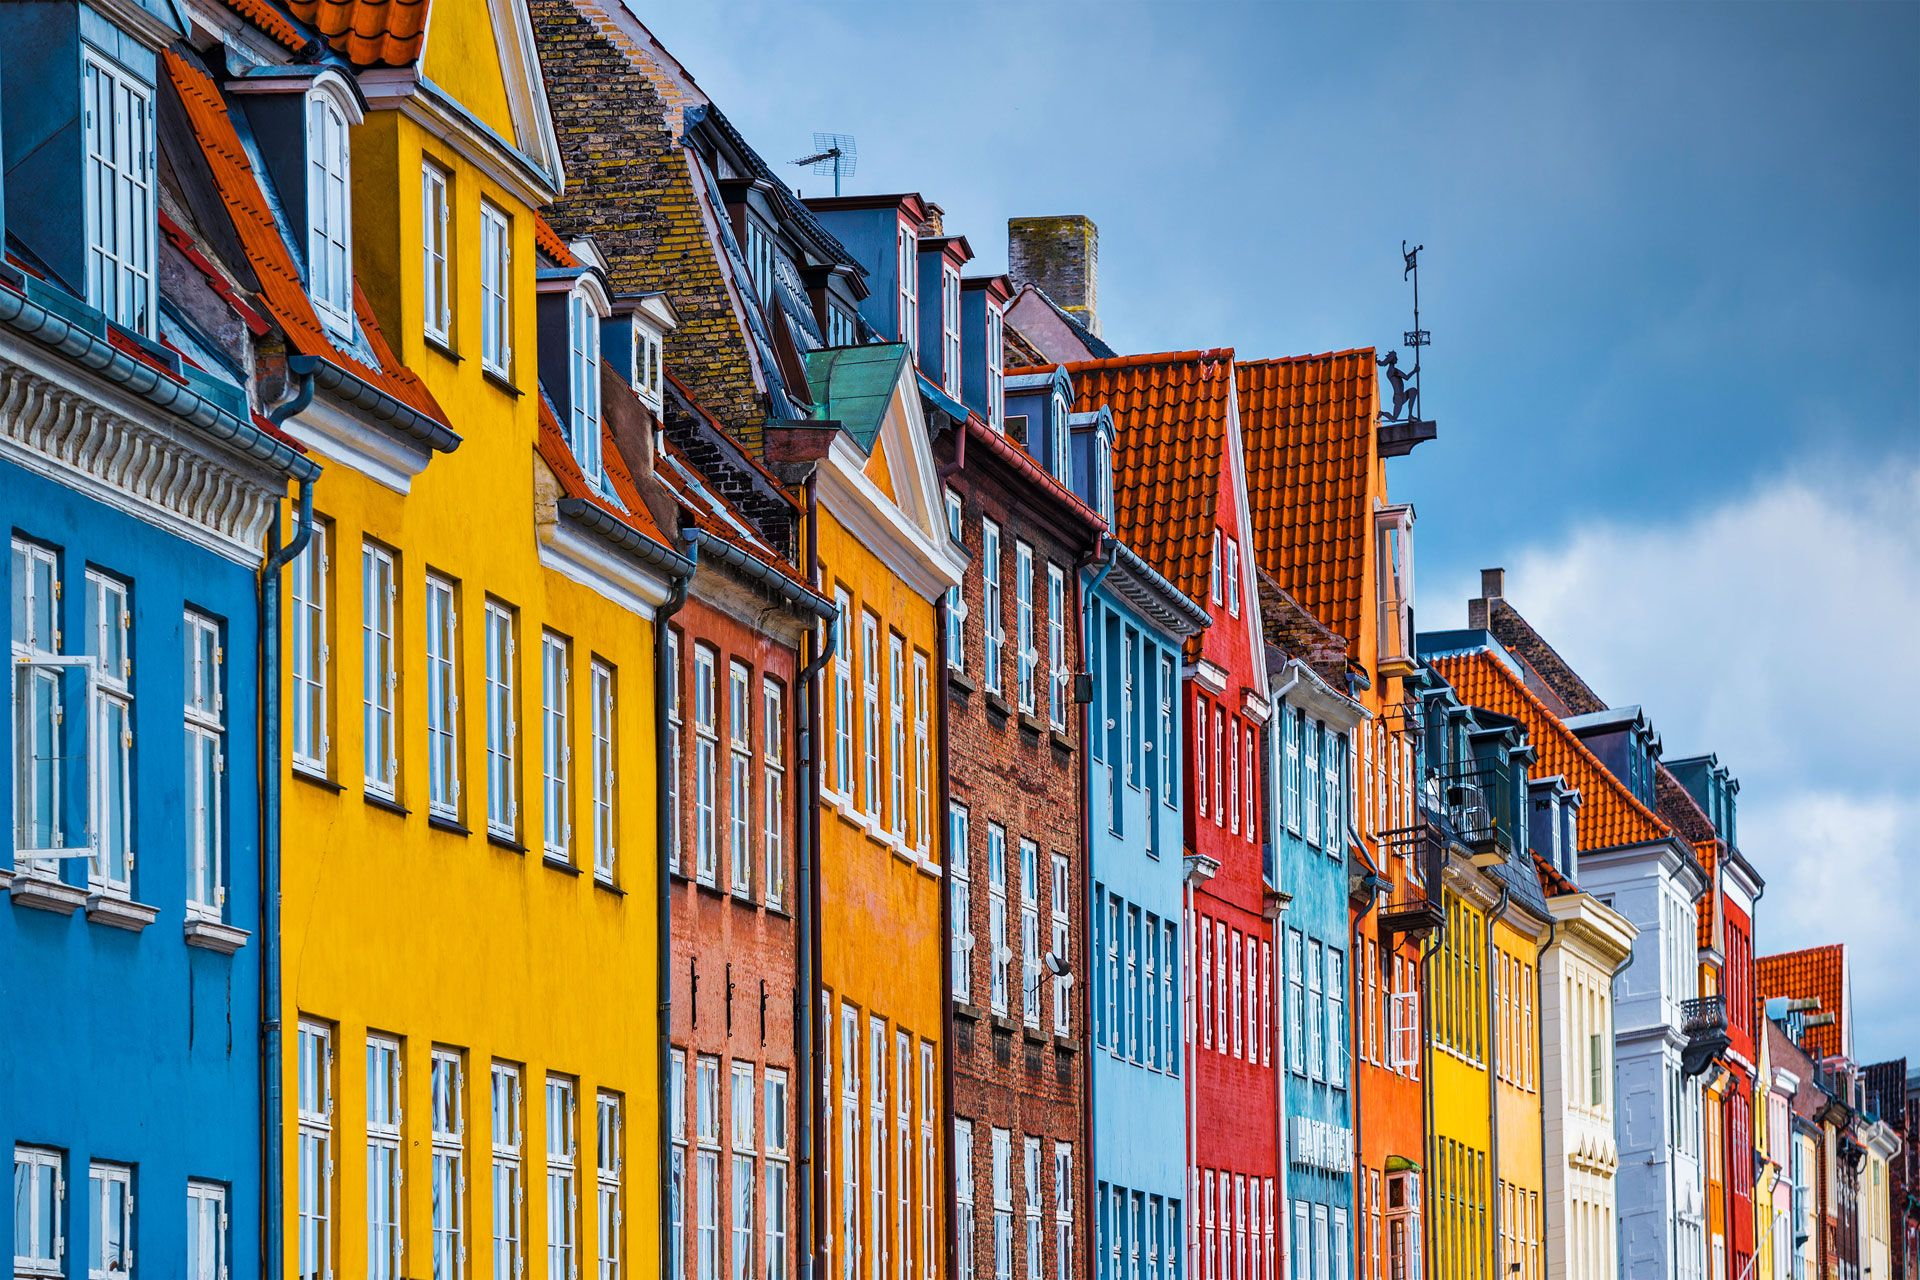 Iceland, Denmark, Norway, Sweden, Finland - Nordic Findings